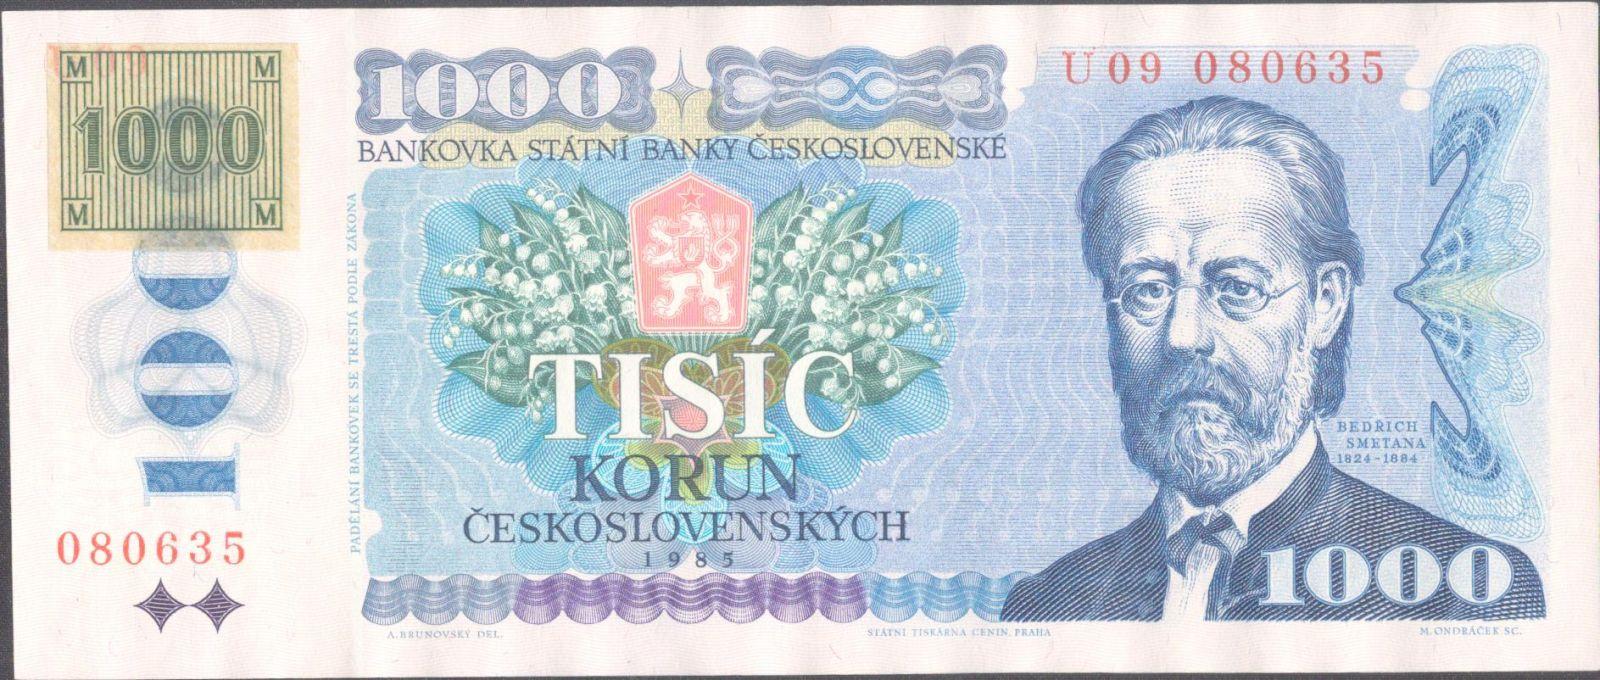 1000Kč/1985-93/, stav UNC, lepený kolek ČR, série U 09